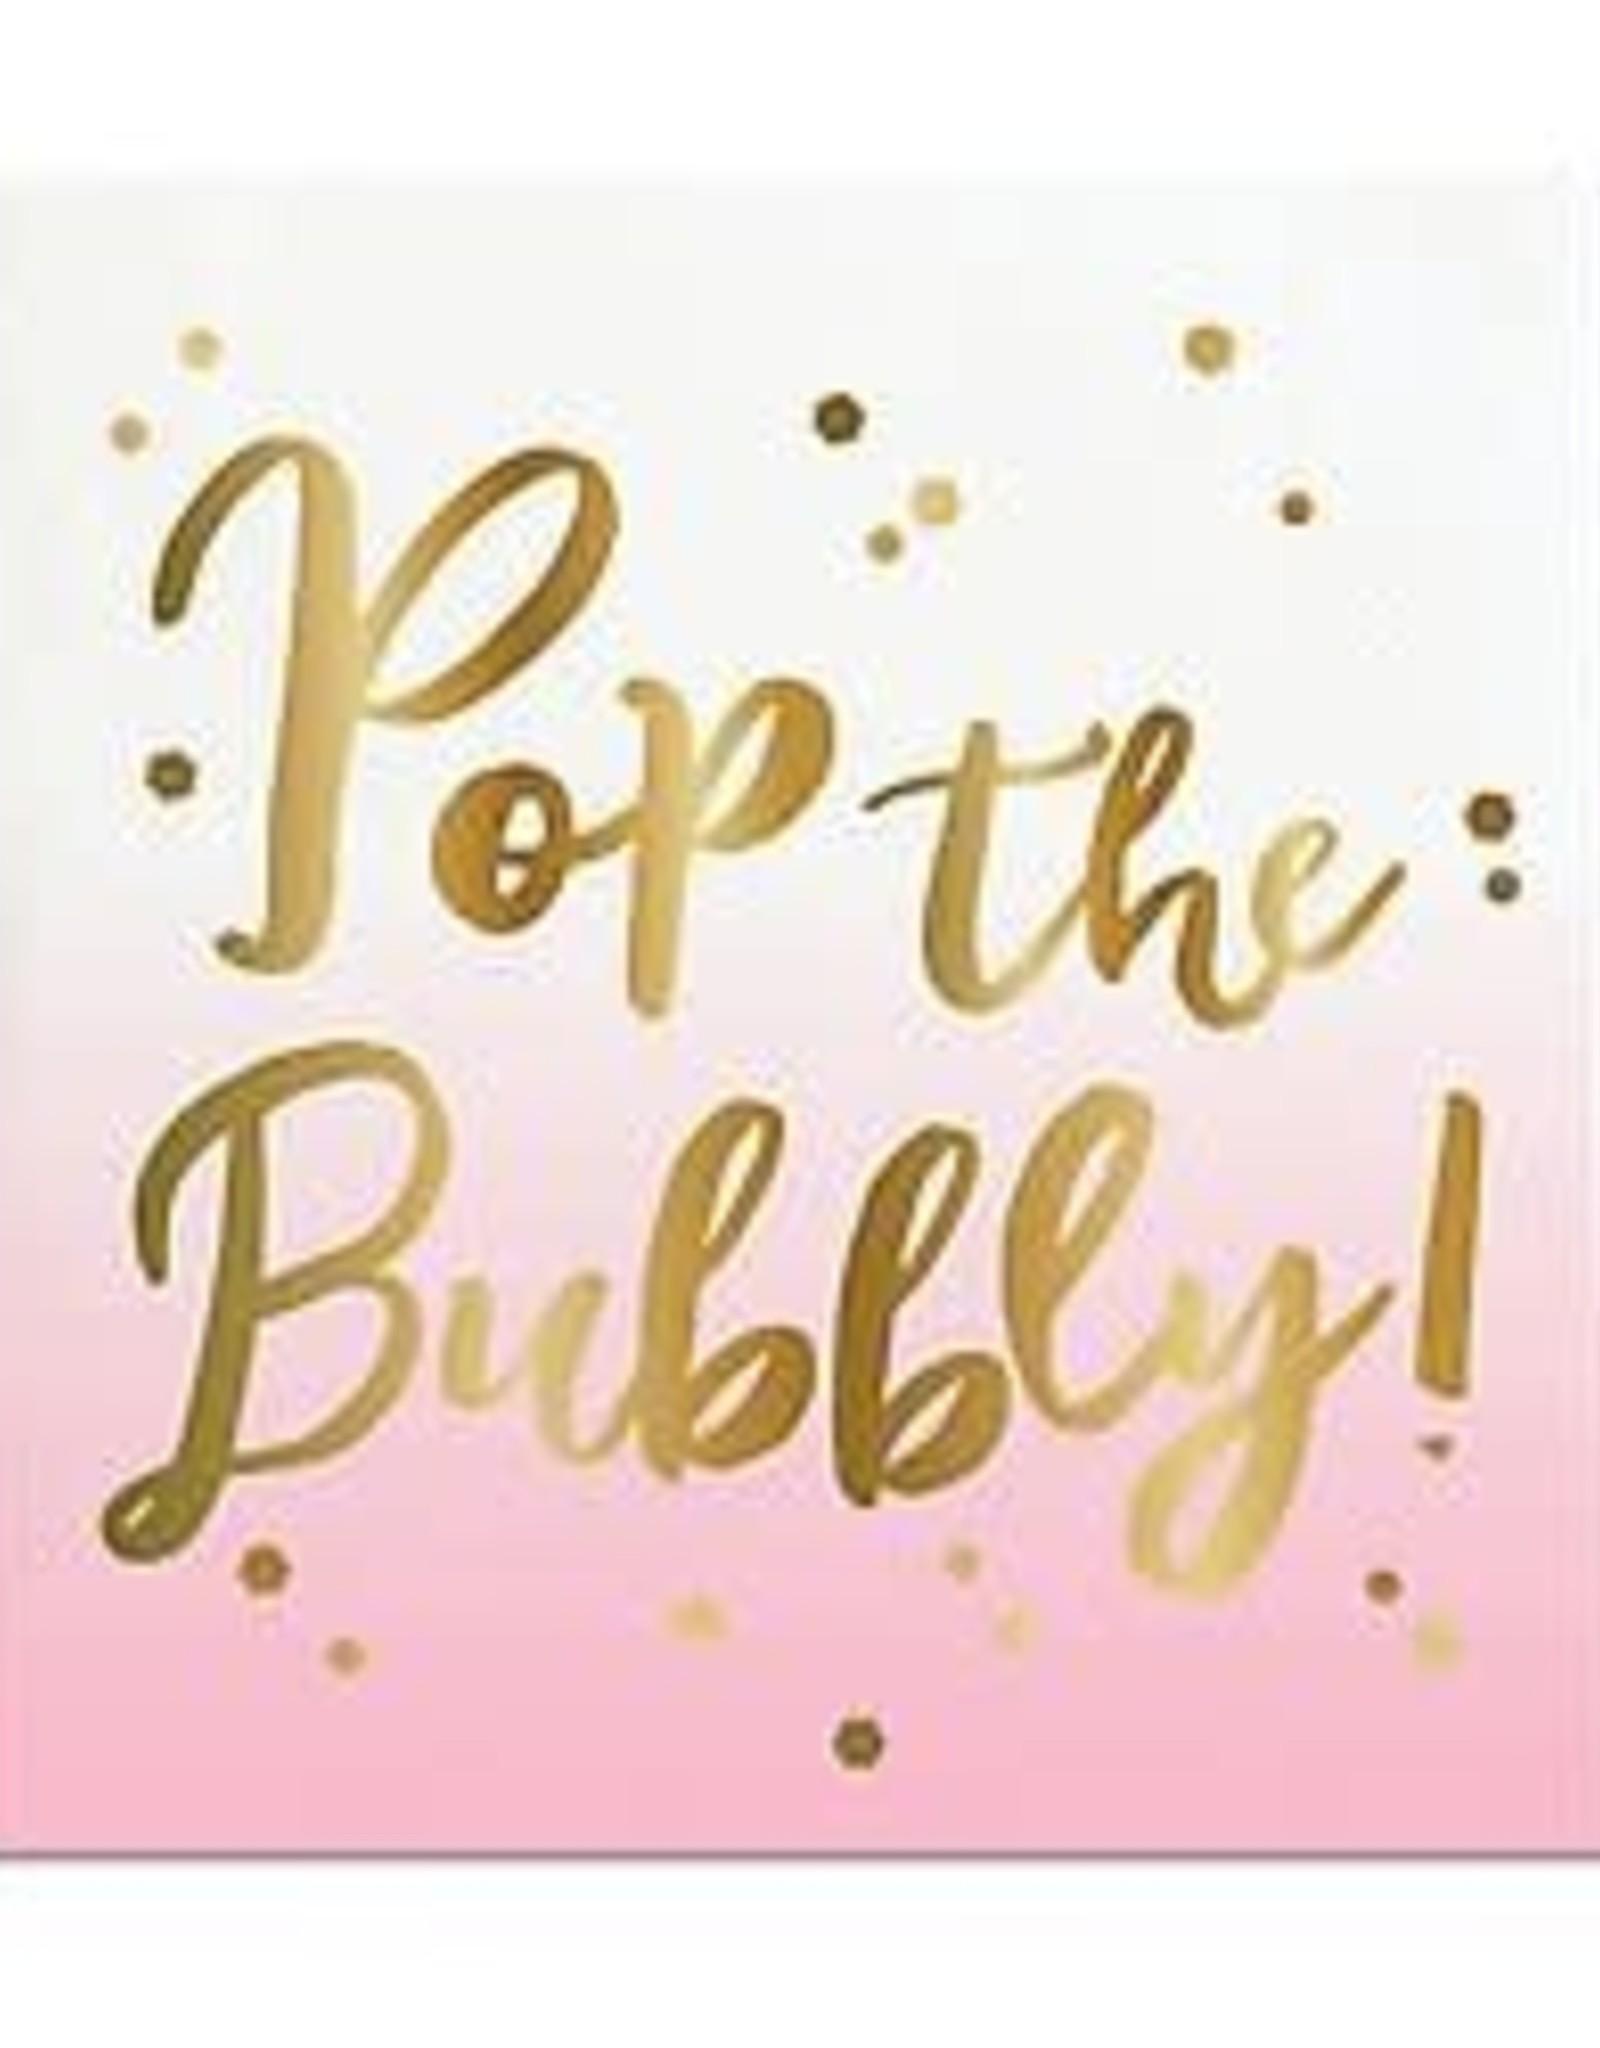 Slant Bev Napkin- Pop the Bubbly